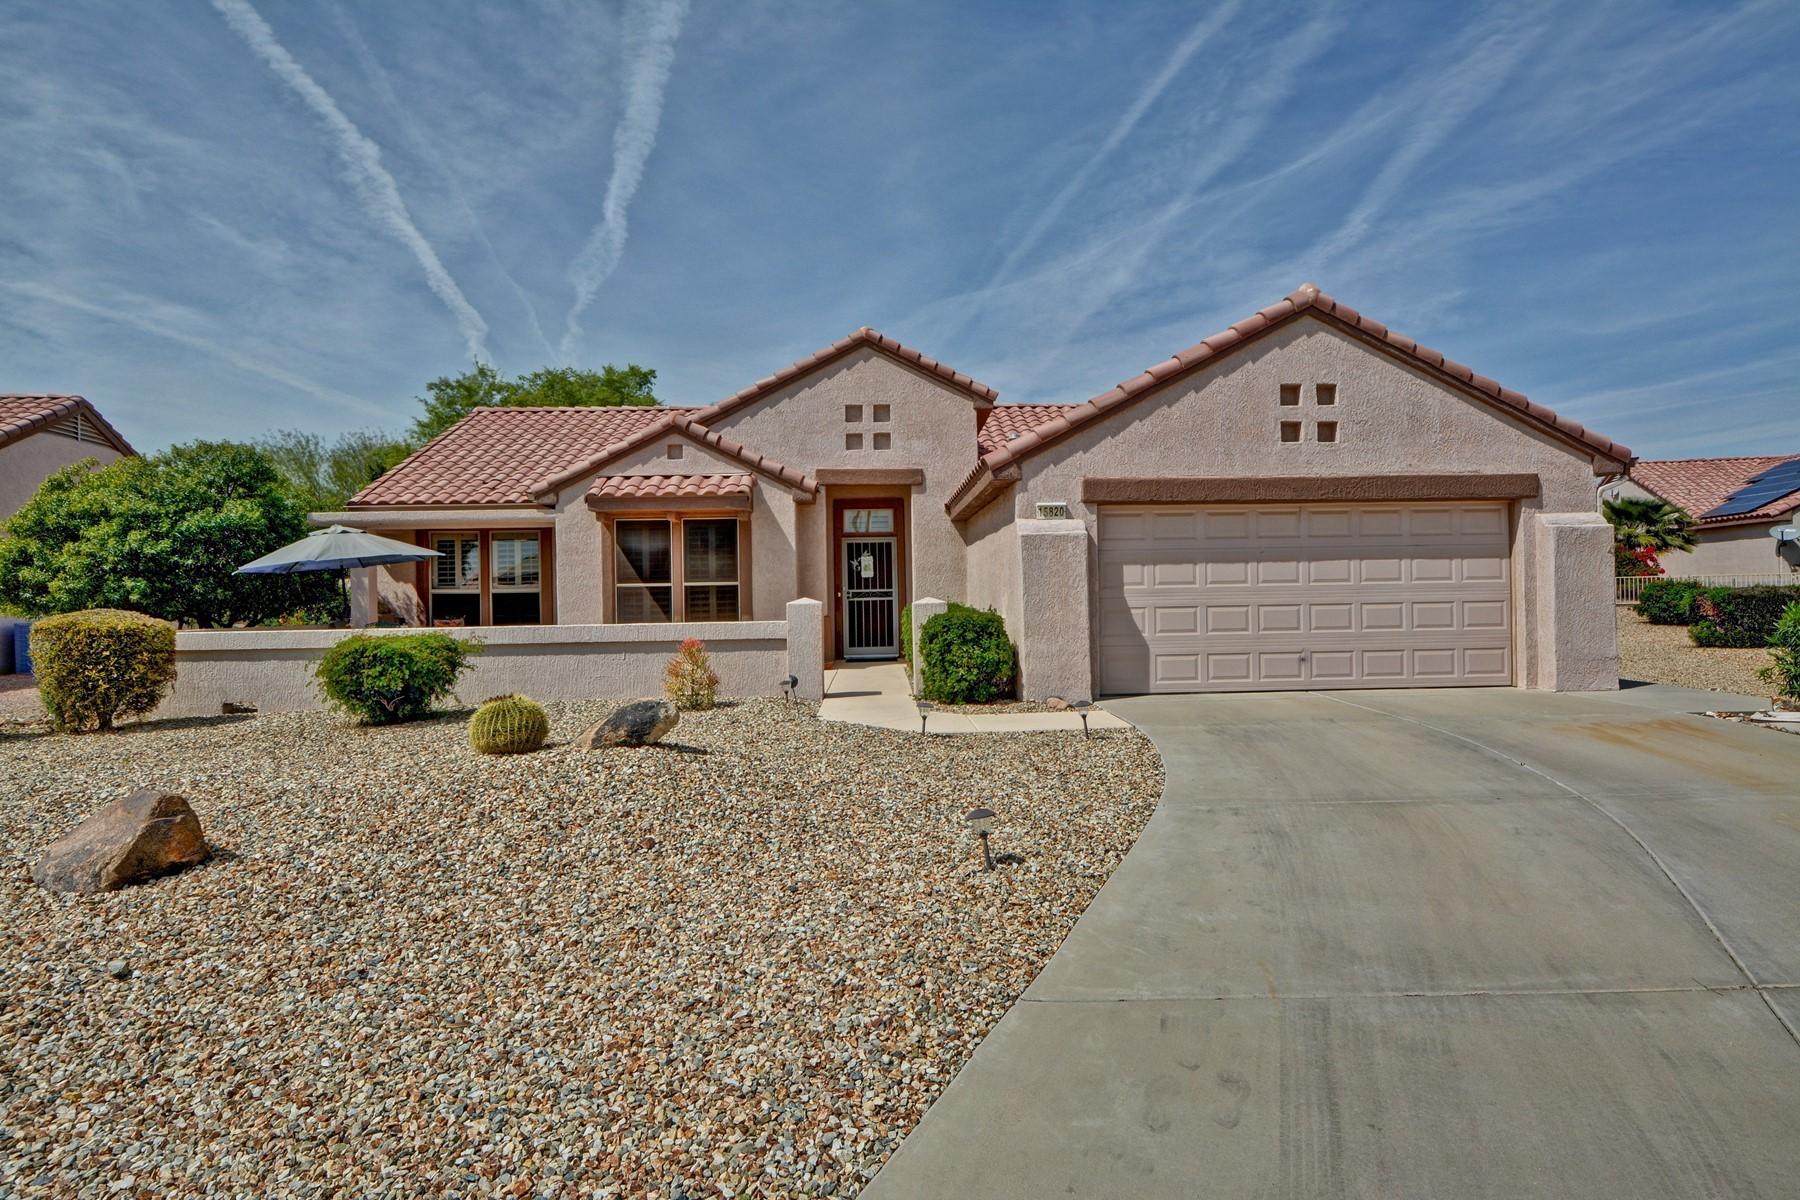 Single Family Homes για την Πώληση στο Palo Verde 15820 W CLEAR CANYON DR, Surprise, Αριζονα 85374 Ηνωμένες Πολιτείες